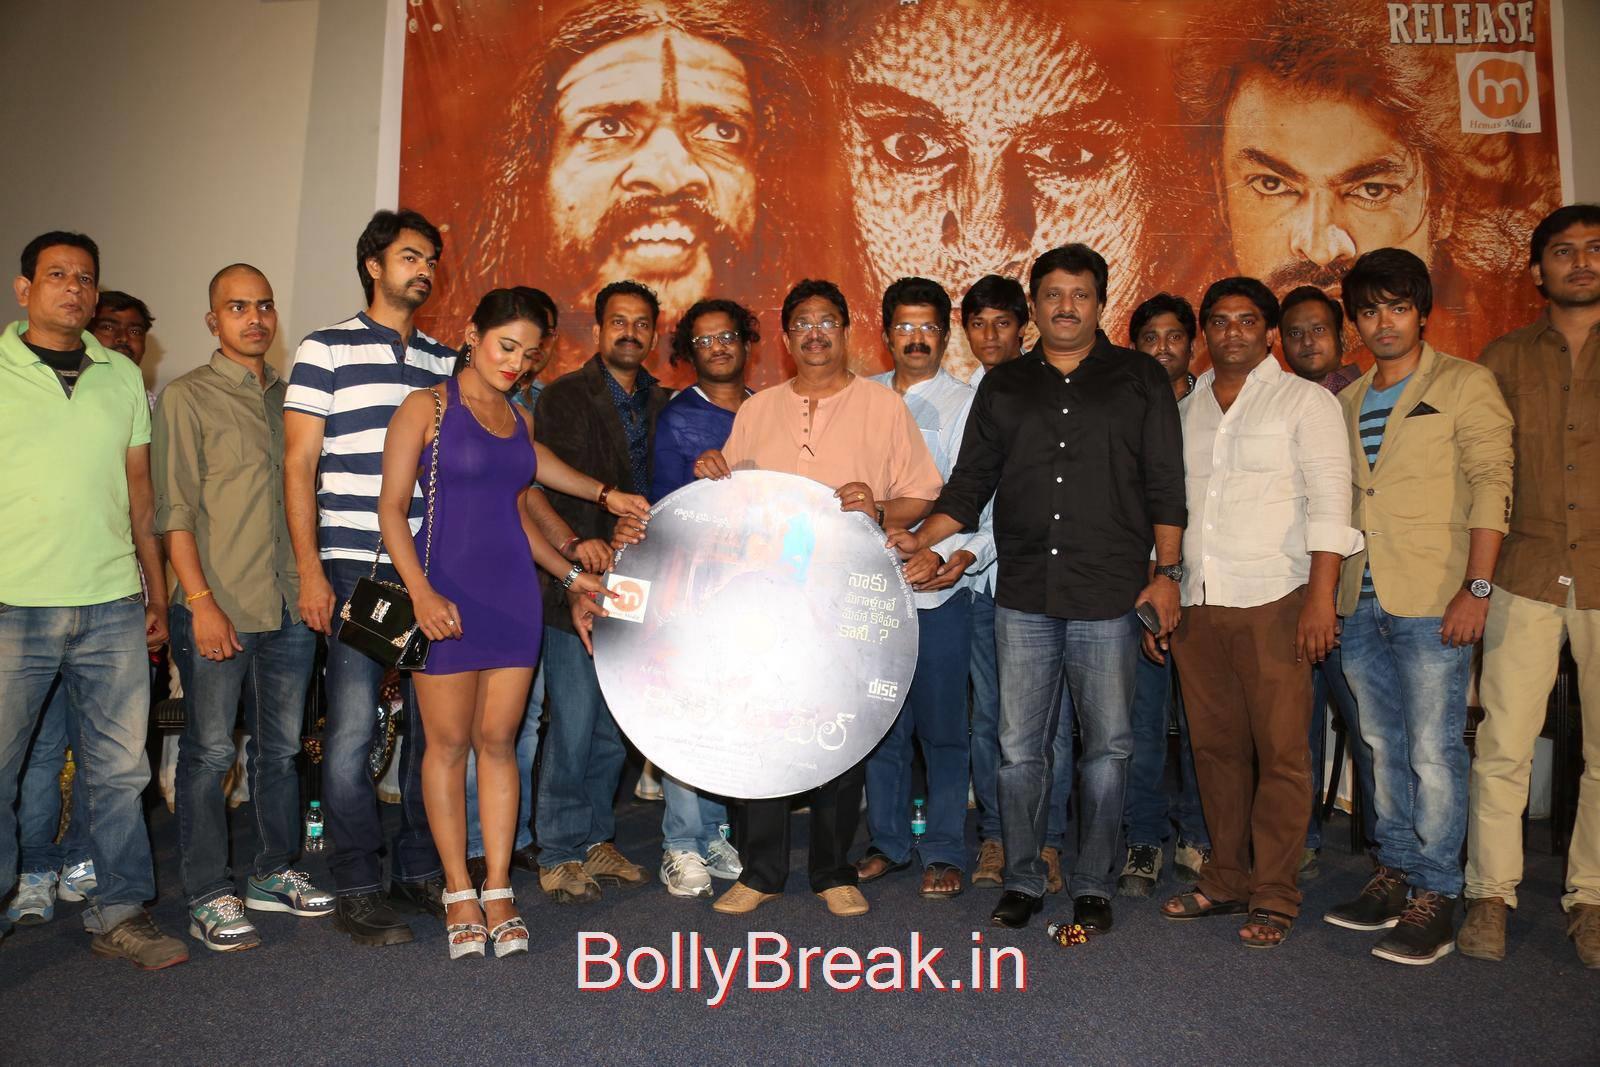 Ravi Varma-Calling Bell Cinema Audio Launch Photo Gallery, Lucky, Vriti Khanna,Mamatha Rahuth Hot Pics From Calling Bell Movie Audio Launch